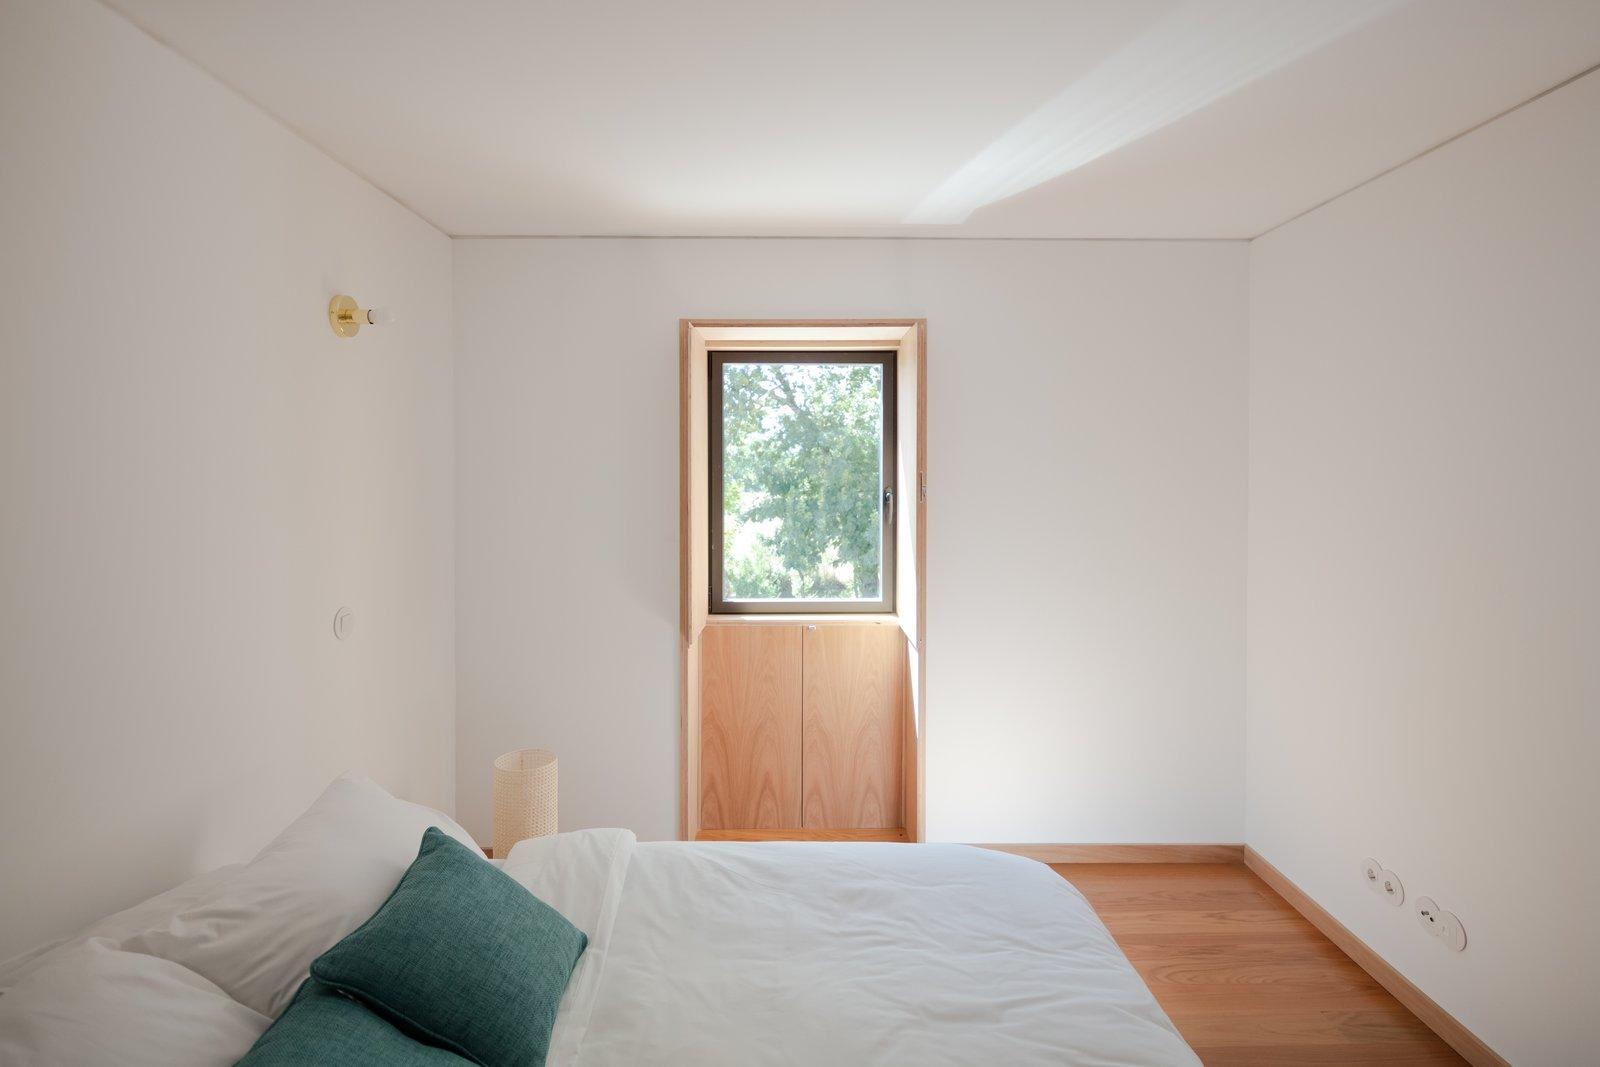 MCR2 House by Filipe Pina Arquitectura Bedroom